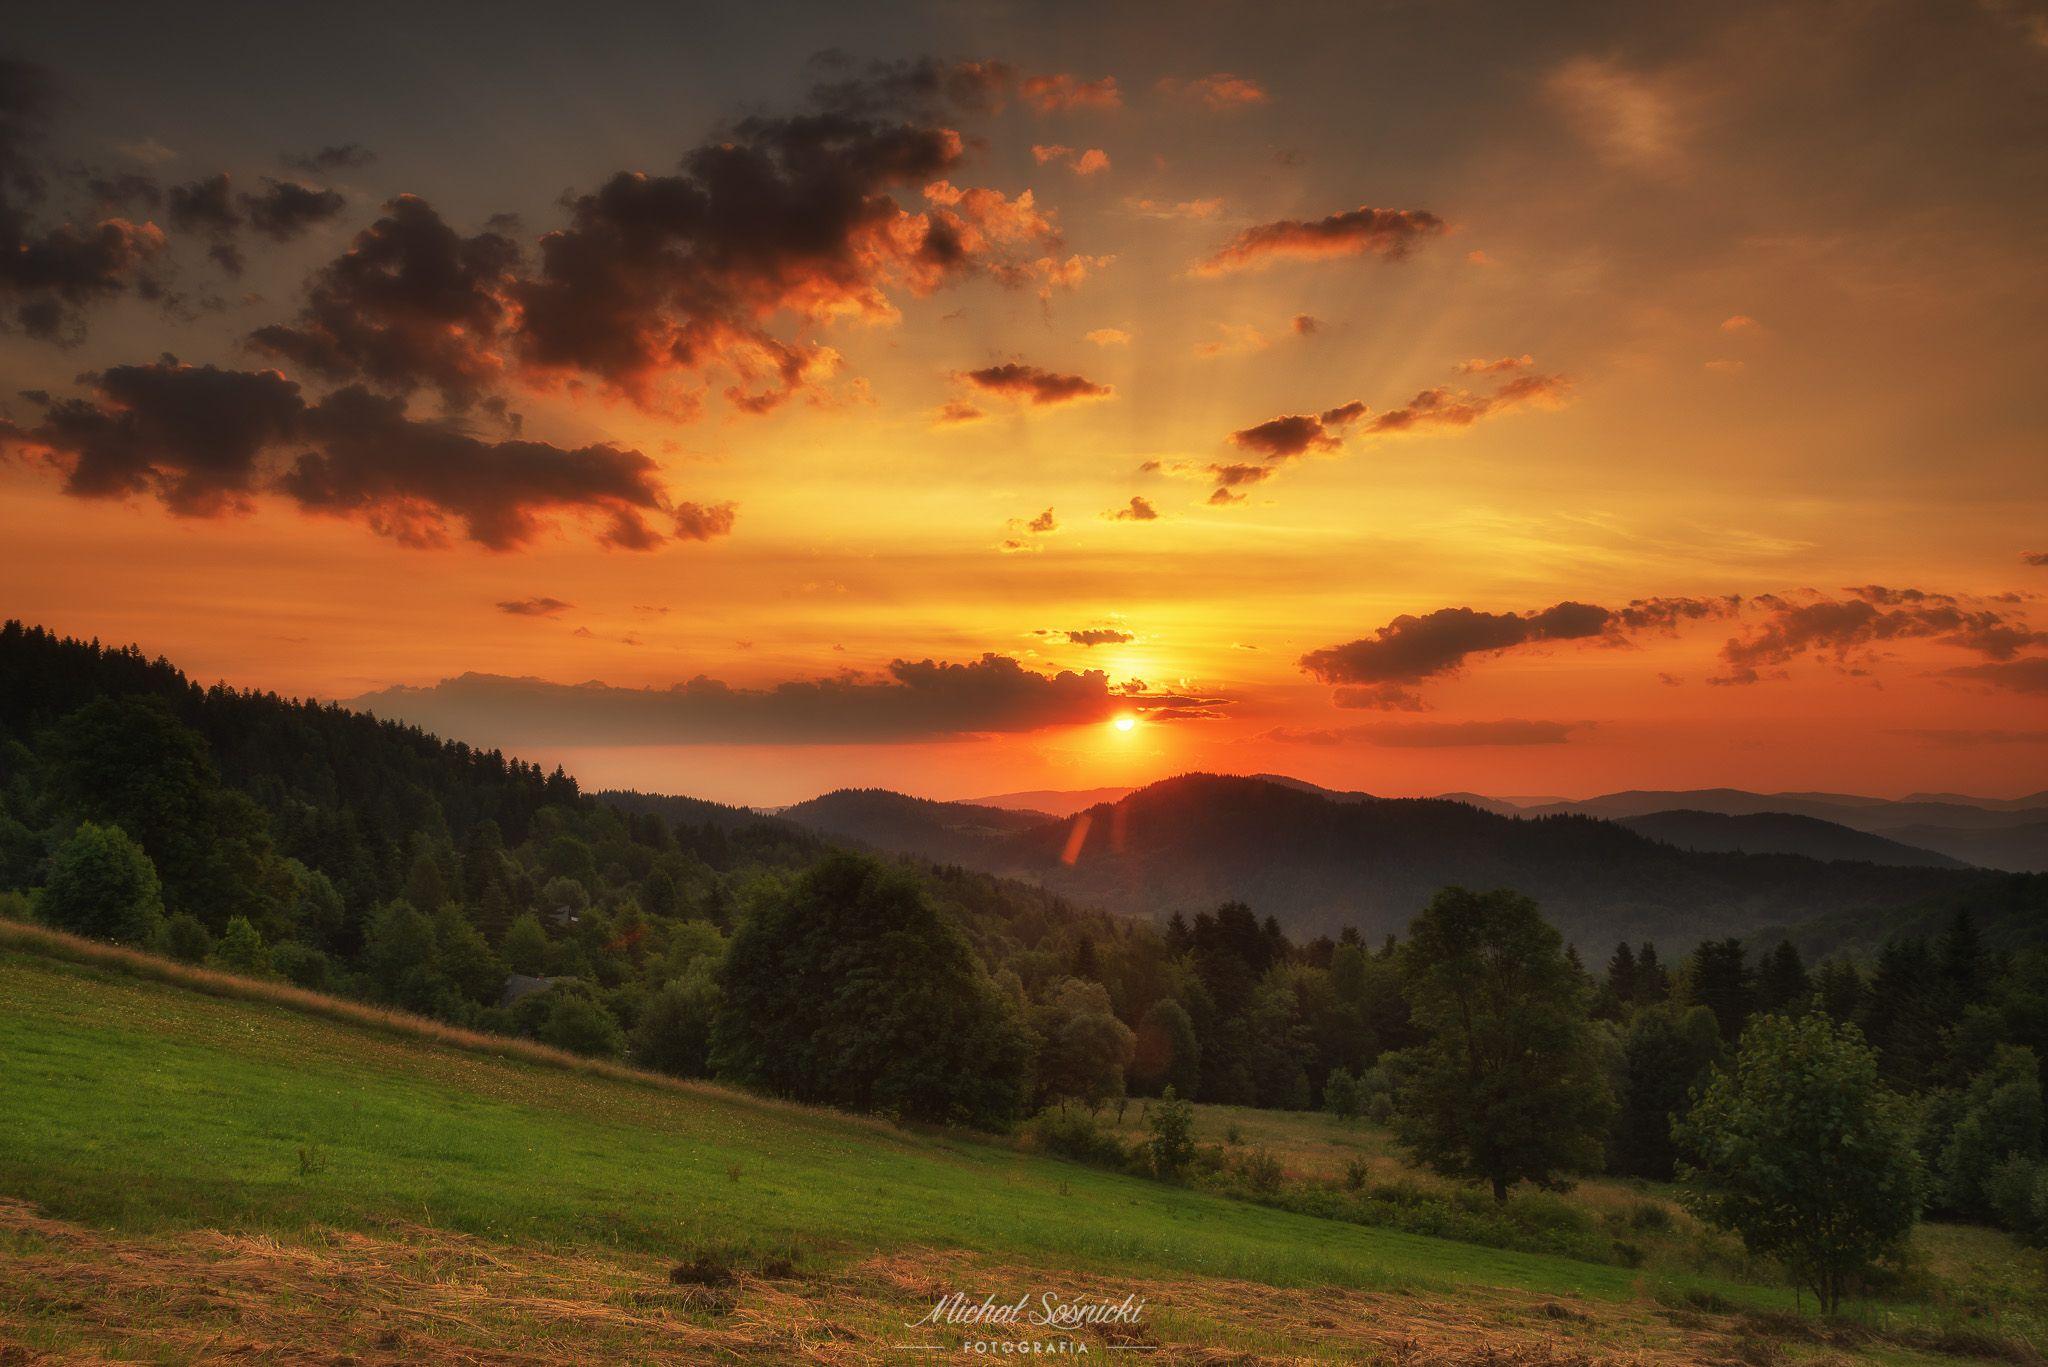 #sunrise #poland #summer #zawoja #pentax #benro #sky #clouds, Sośnicki Michał